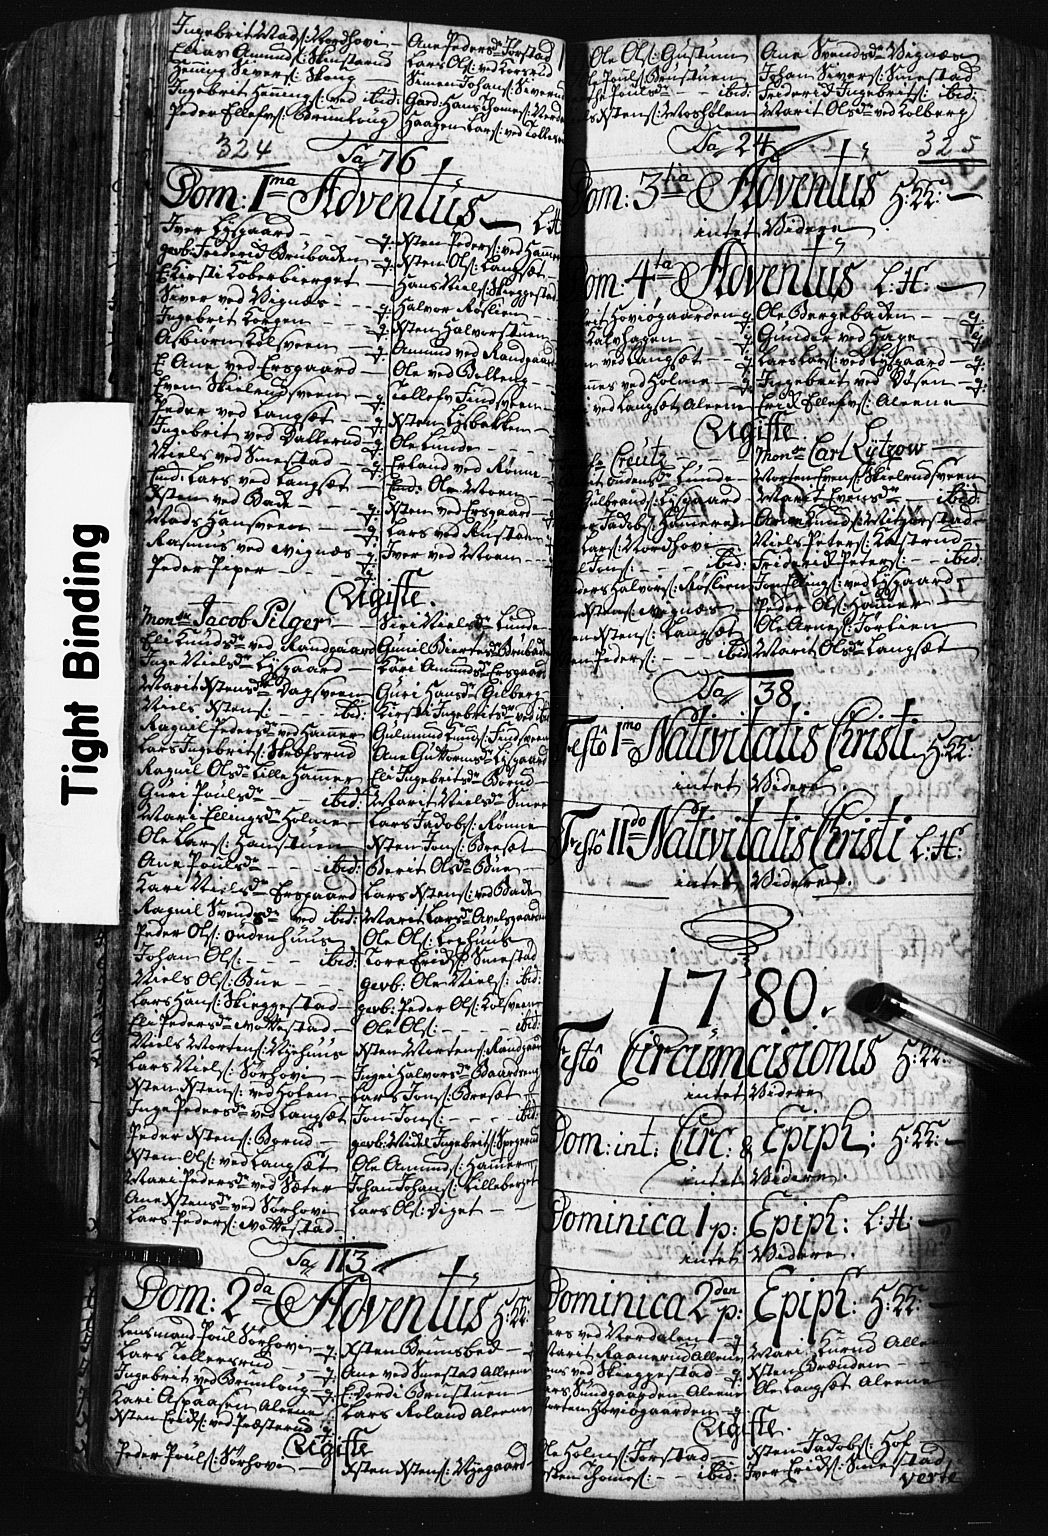 SAH, Fåberg prestekontor, Klokkerbok nr. 3, 1768-1796, s. 324-325